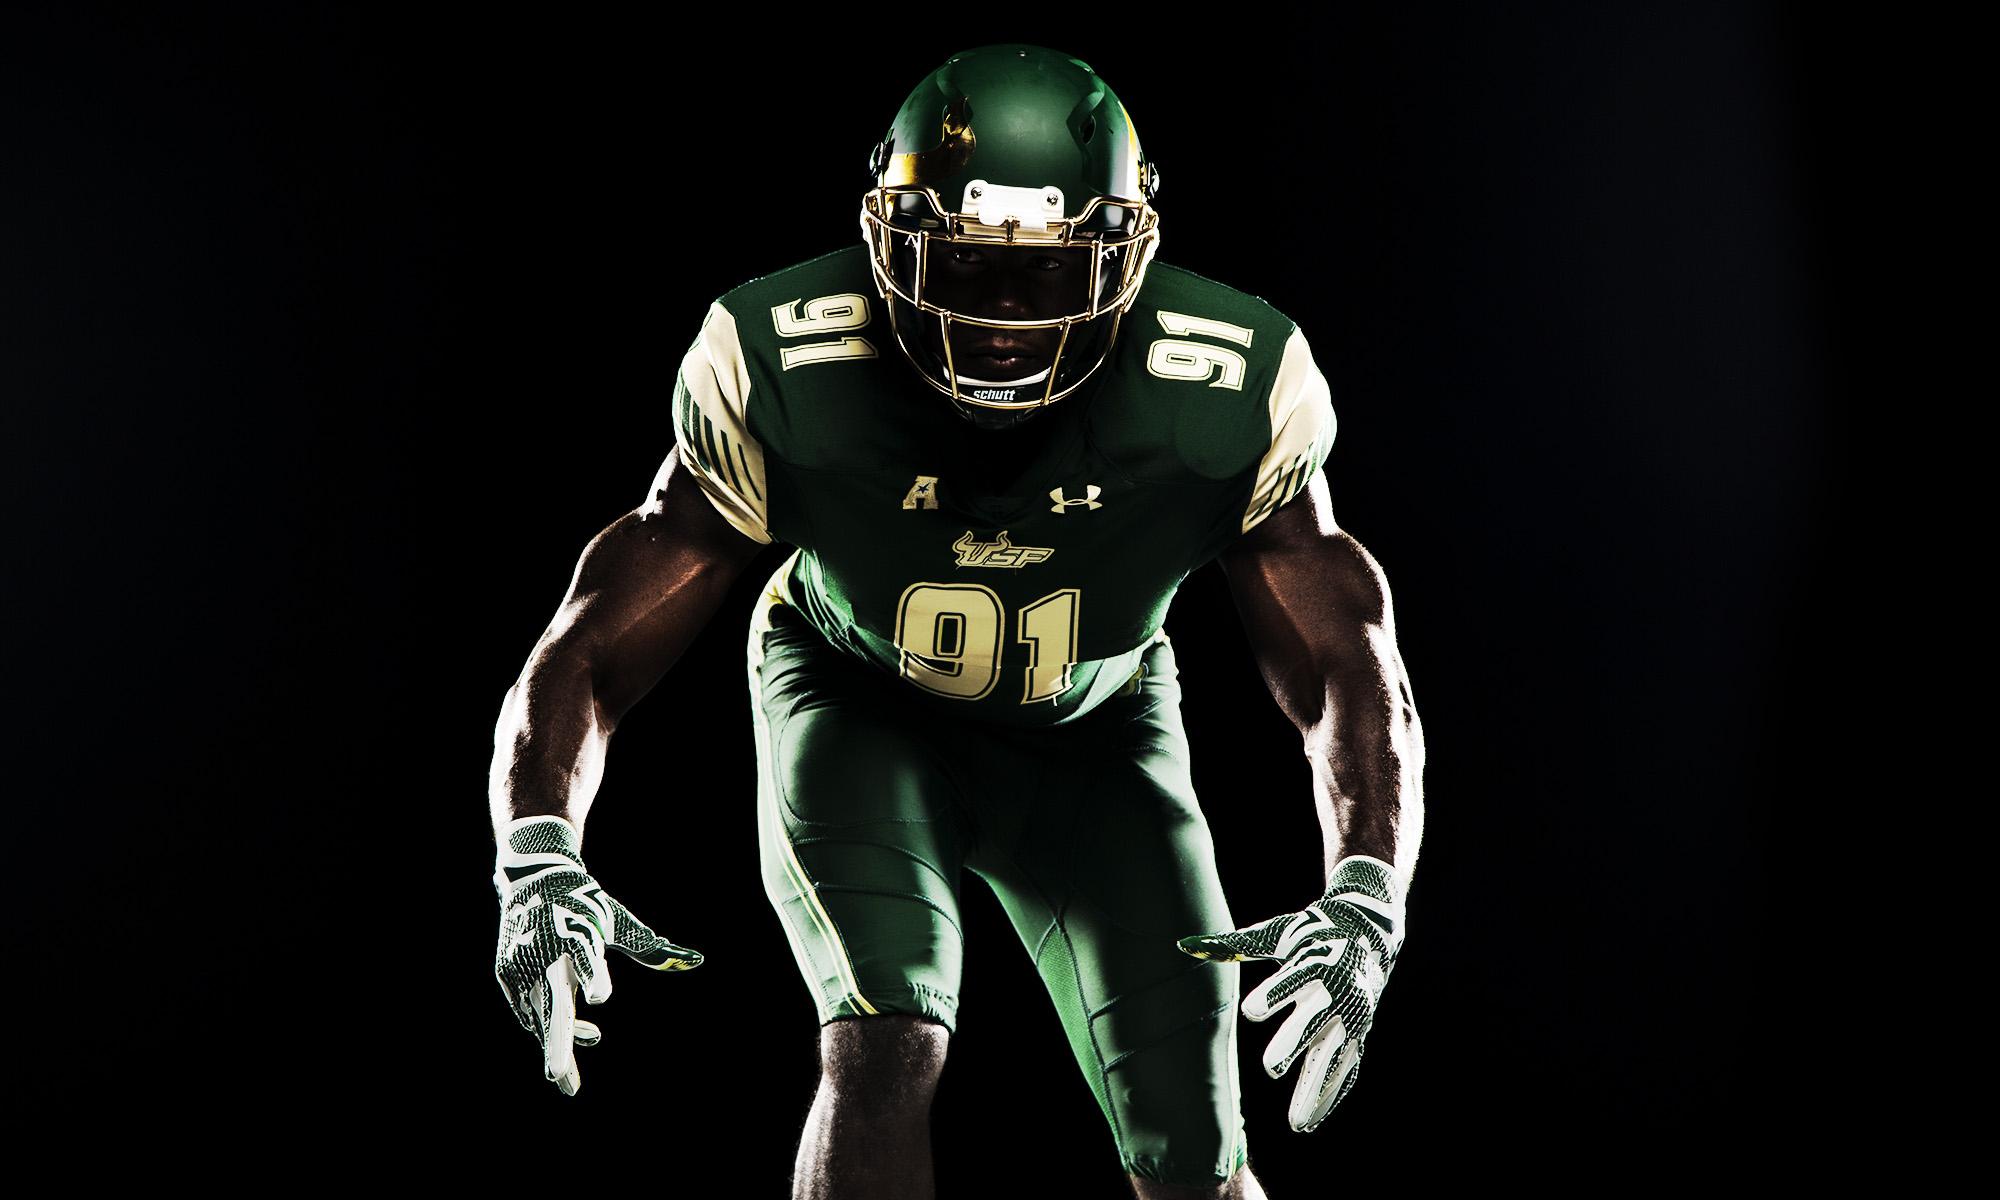 USF-Football-Green-585